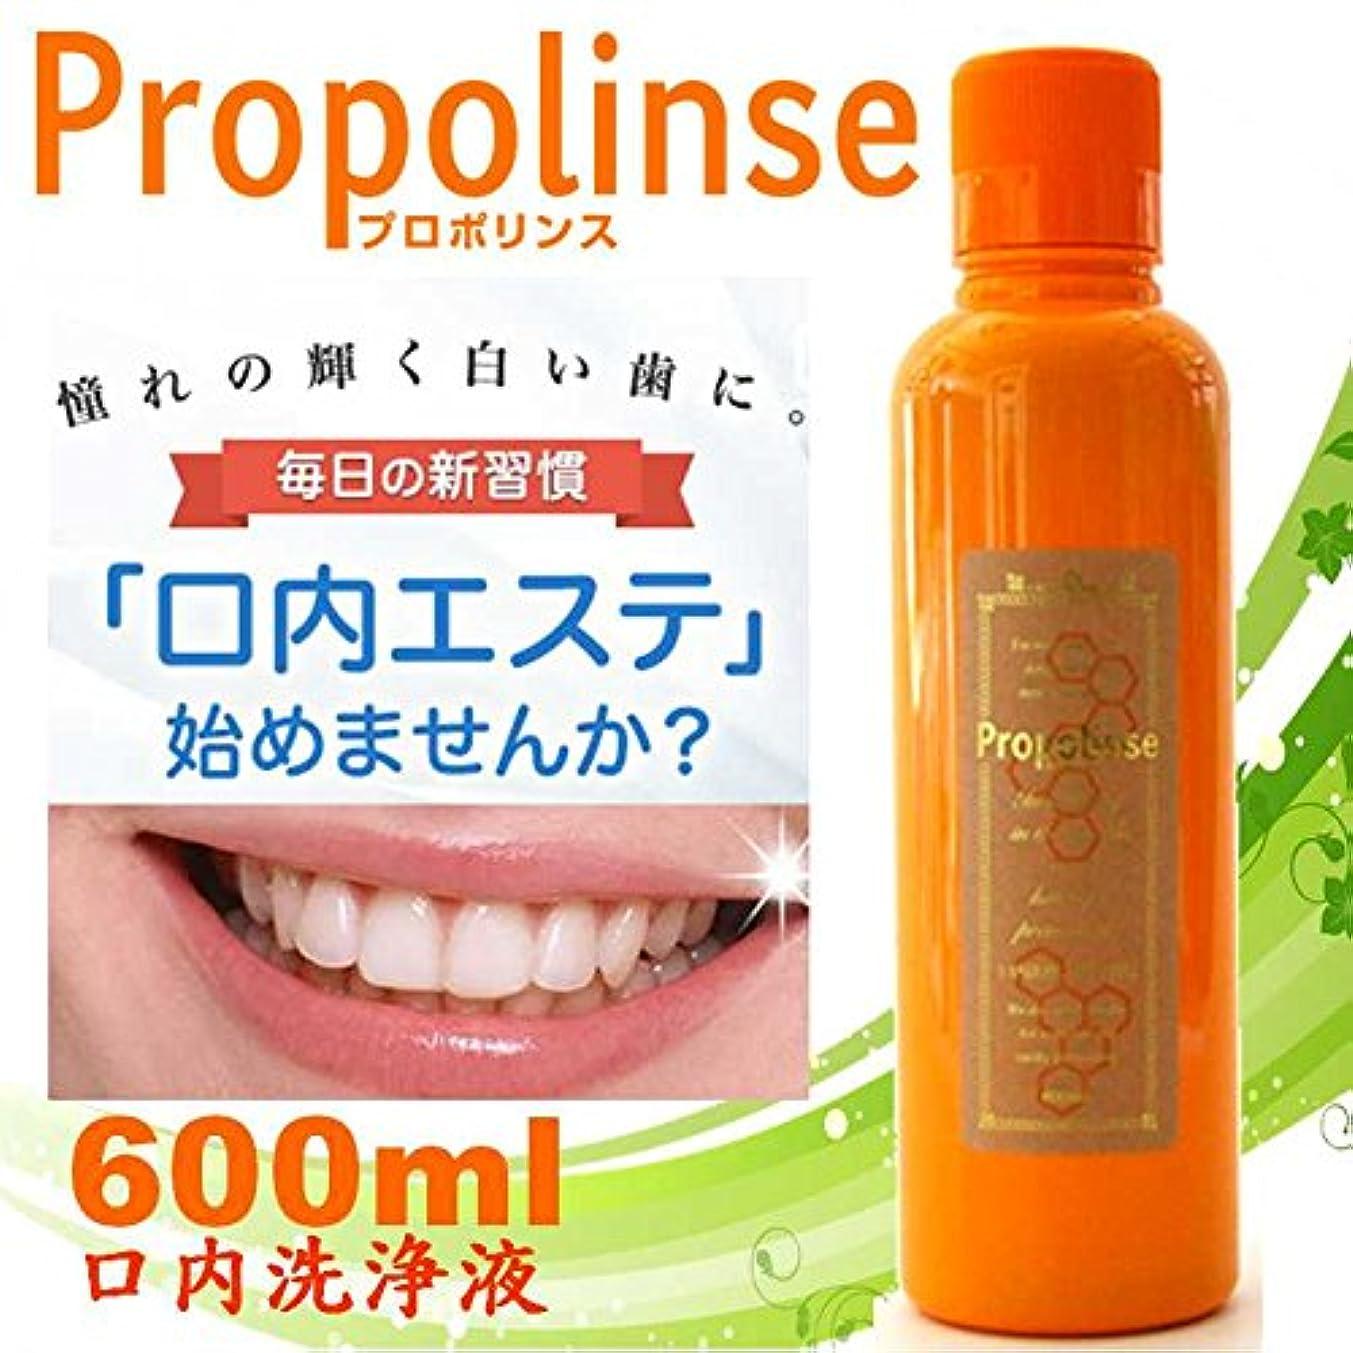 Propolinse プロポリンス 600ml×30本 洗口液 口内洗浄